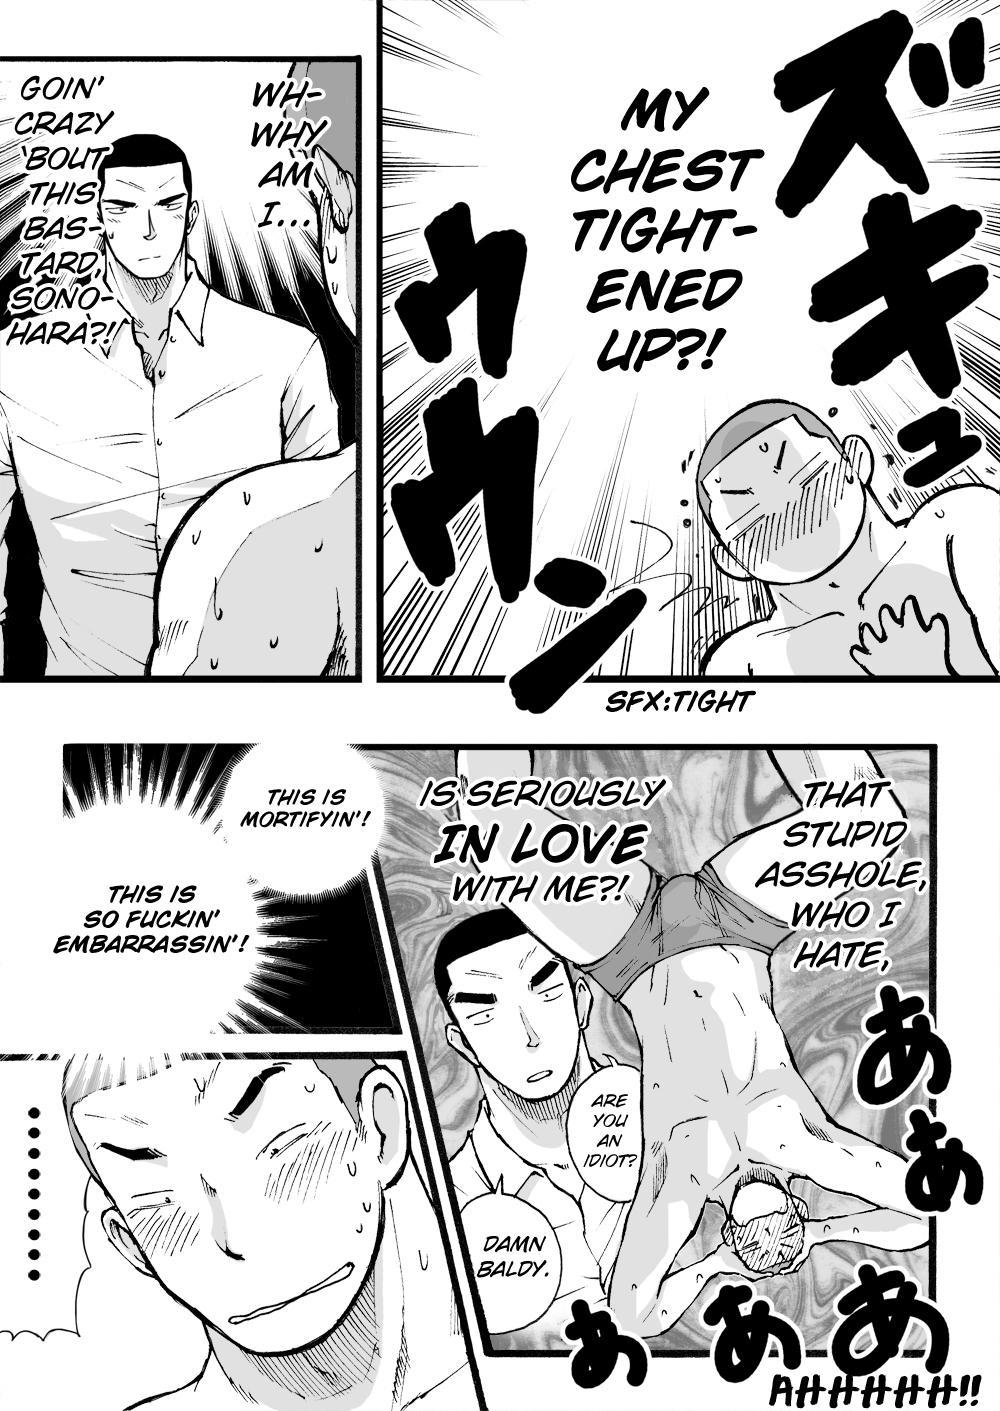 [Akahachi] Motemote Yakyuubu Otoko [Kouhen] | Popular Baseball Club Boys (Part Two) [English] [Papatez] 20